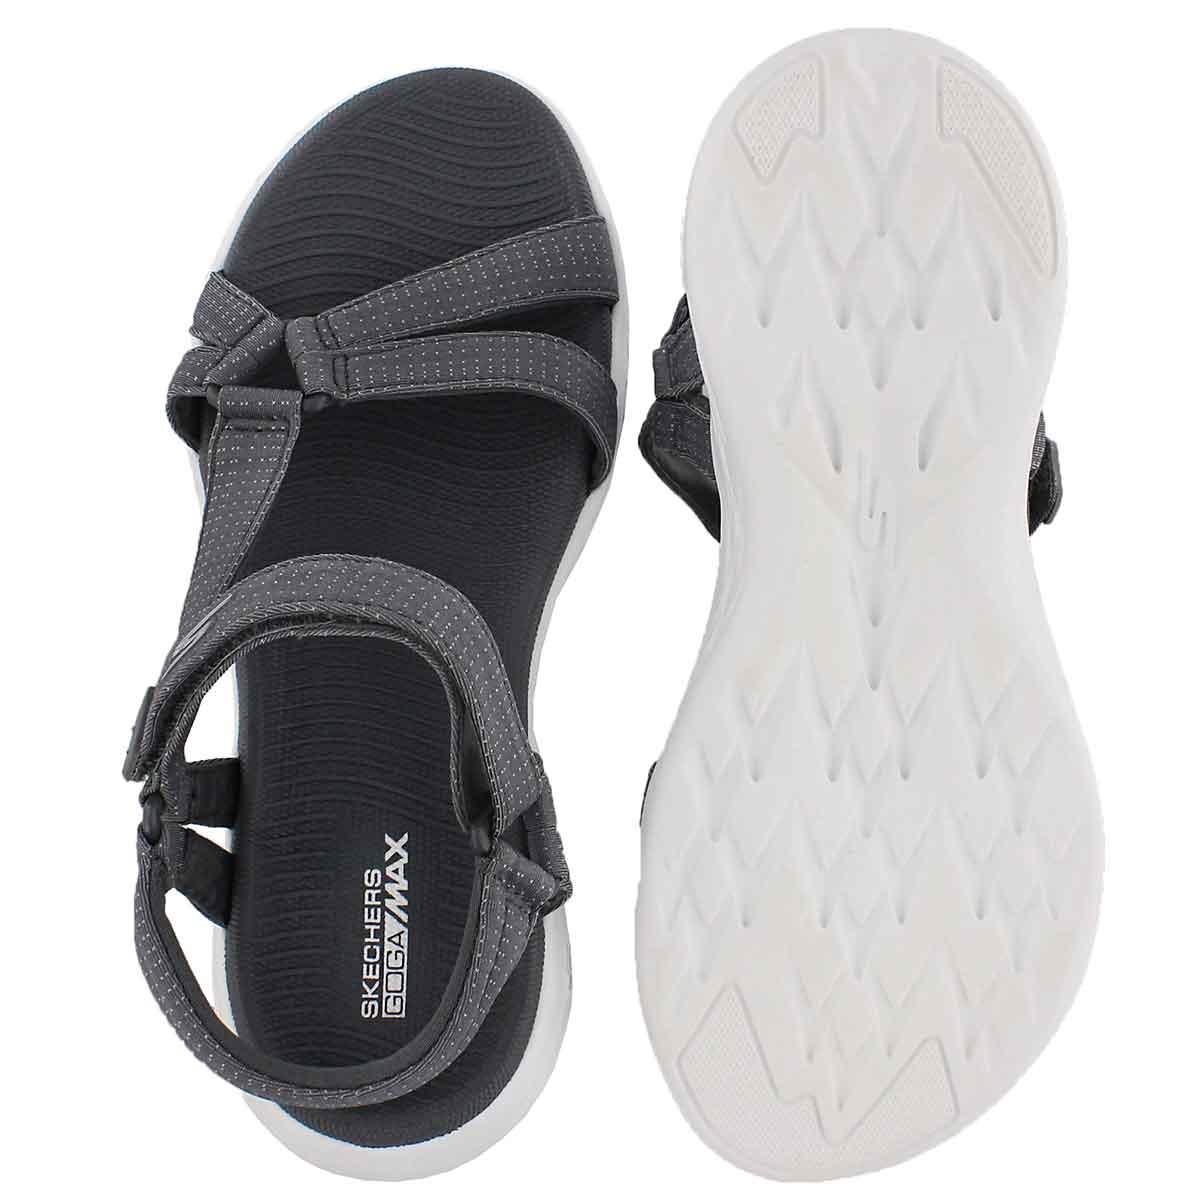 Sandales sport ON THE GO 600 BRILLIANCY, femmes